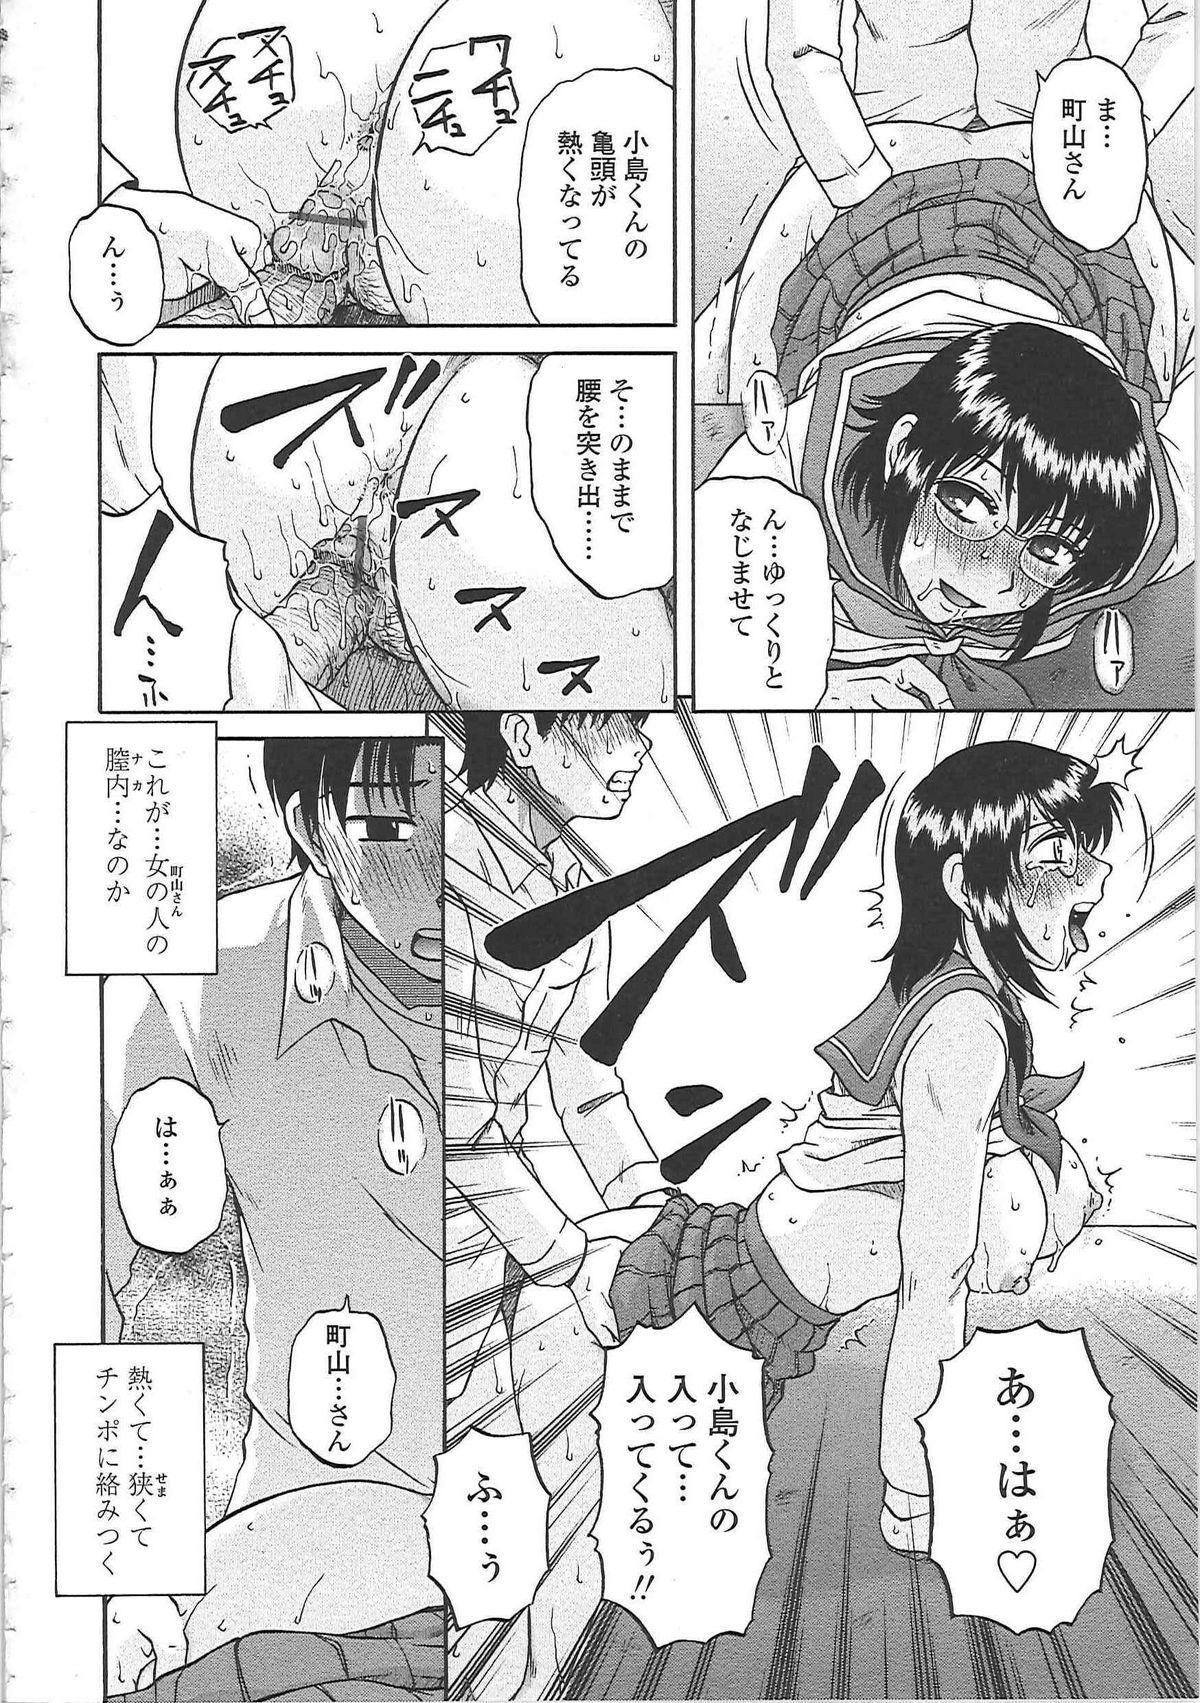 Nikuzuma Tsuushin - Erotic Wife Communication 88